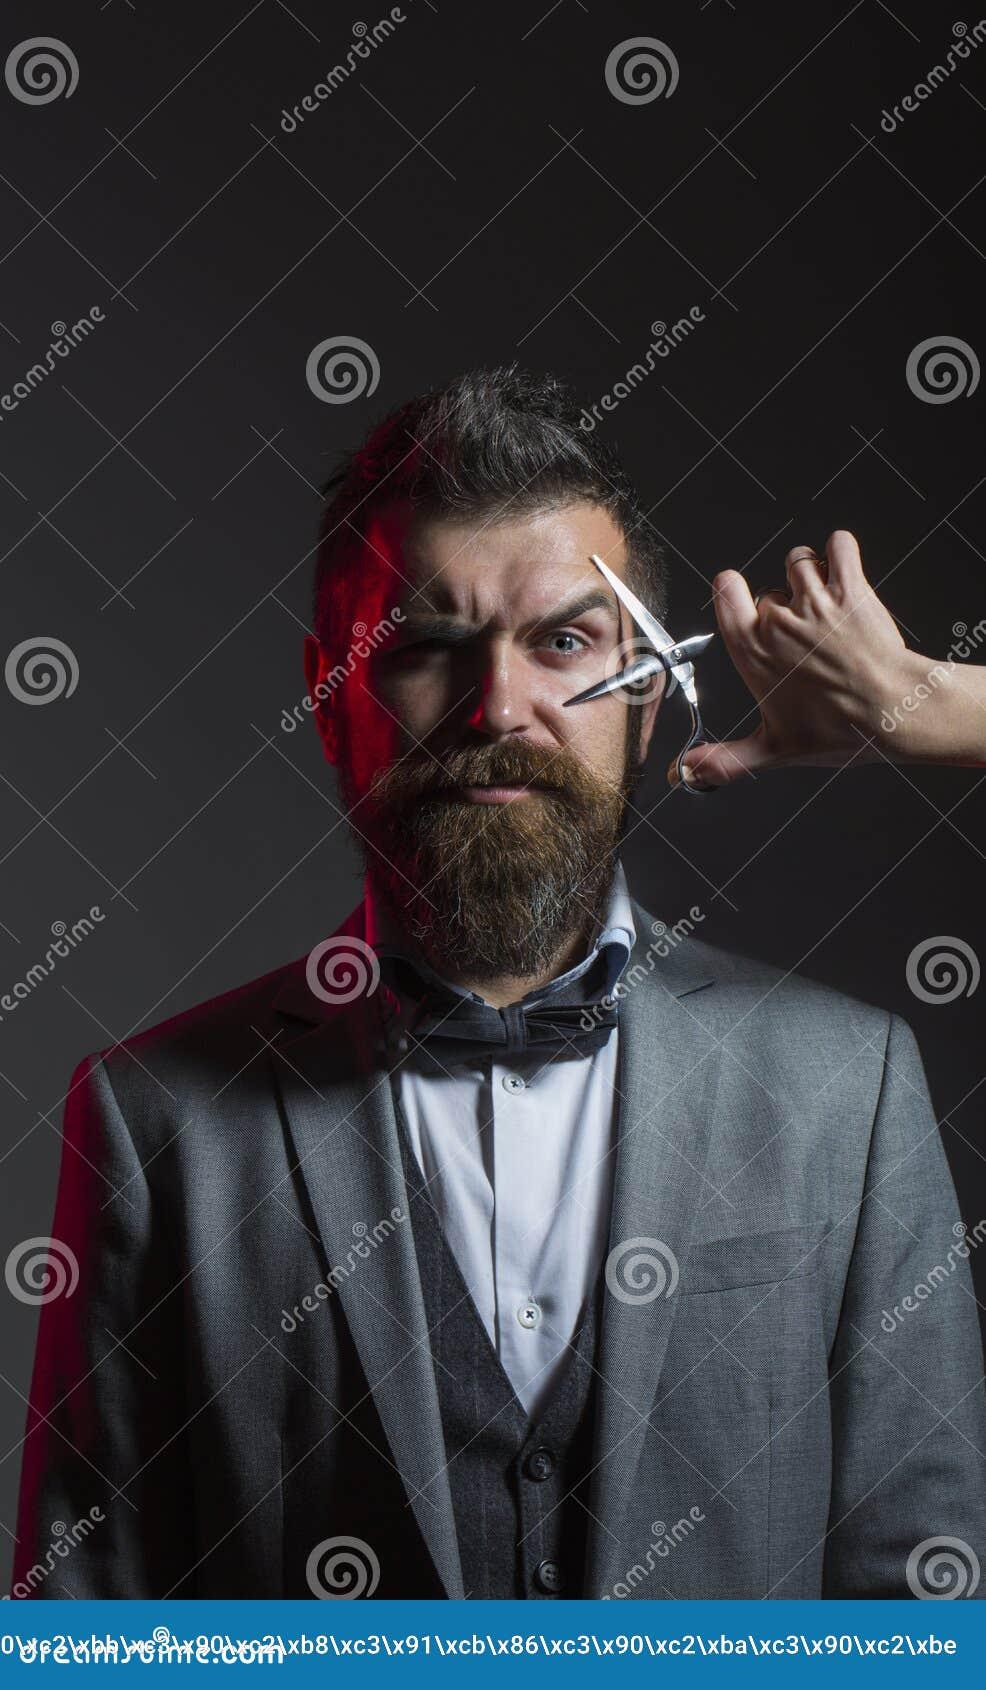 Friseurscheren Der Haarschnitt der Männer Bärtiger Mann, langer Bart, grober, kaukasischer Hippie mit dem Schnurrbart, Haarschnit